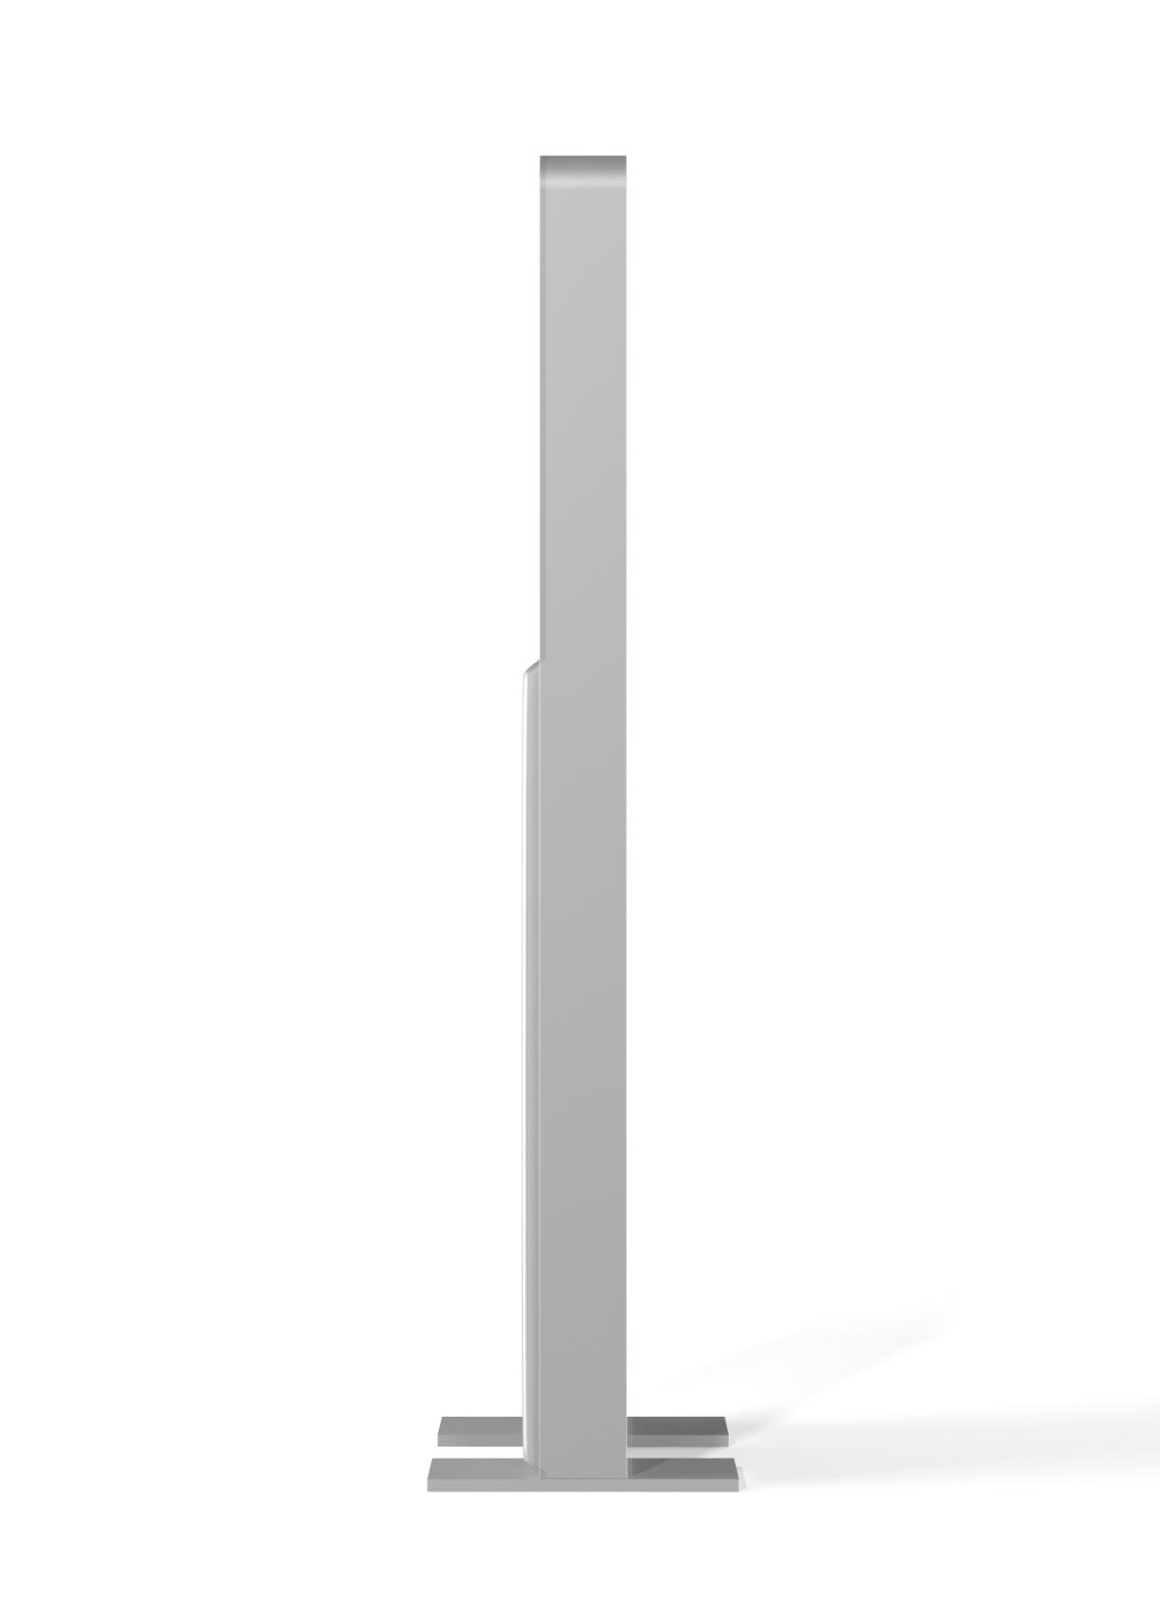 MedSaniStar temperature control kiosk